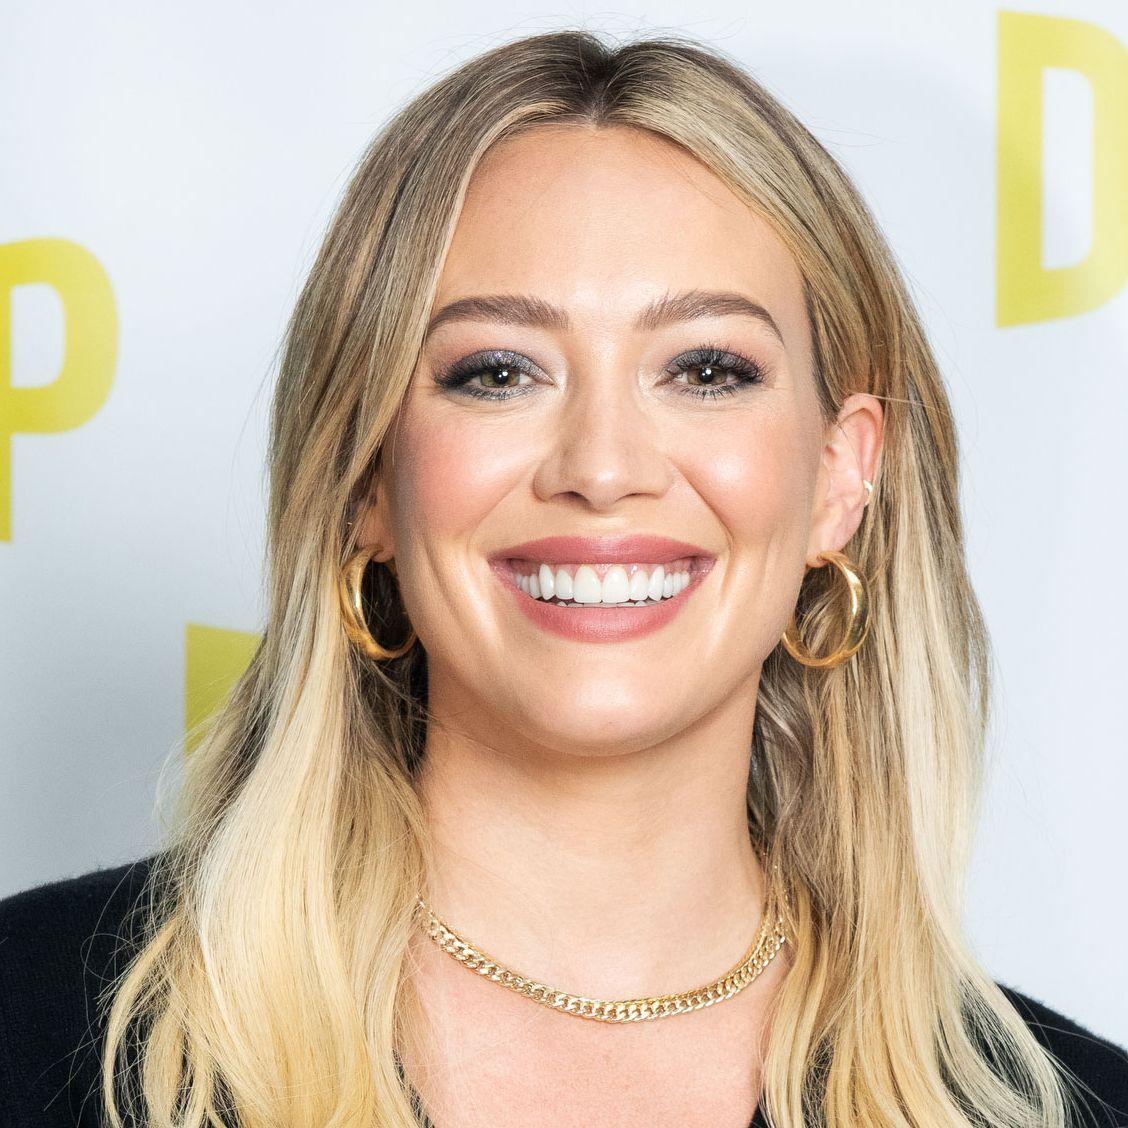 Hilary Duff Says Why Disney+ Postponed 'Lizzie McGuire'